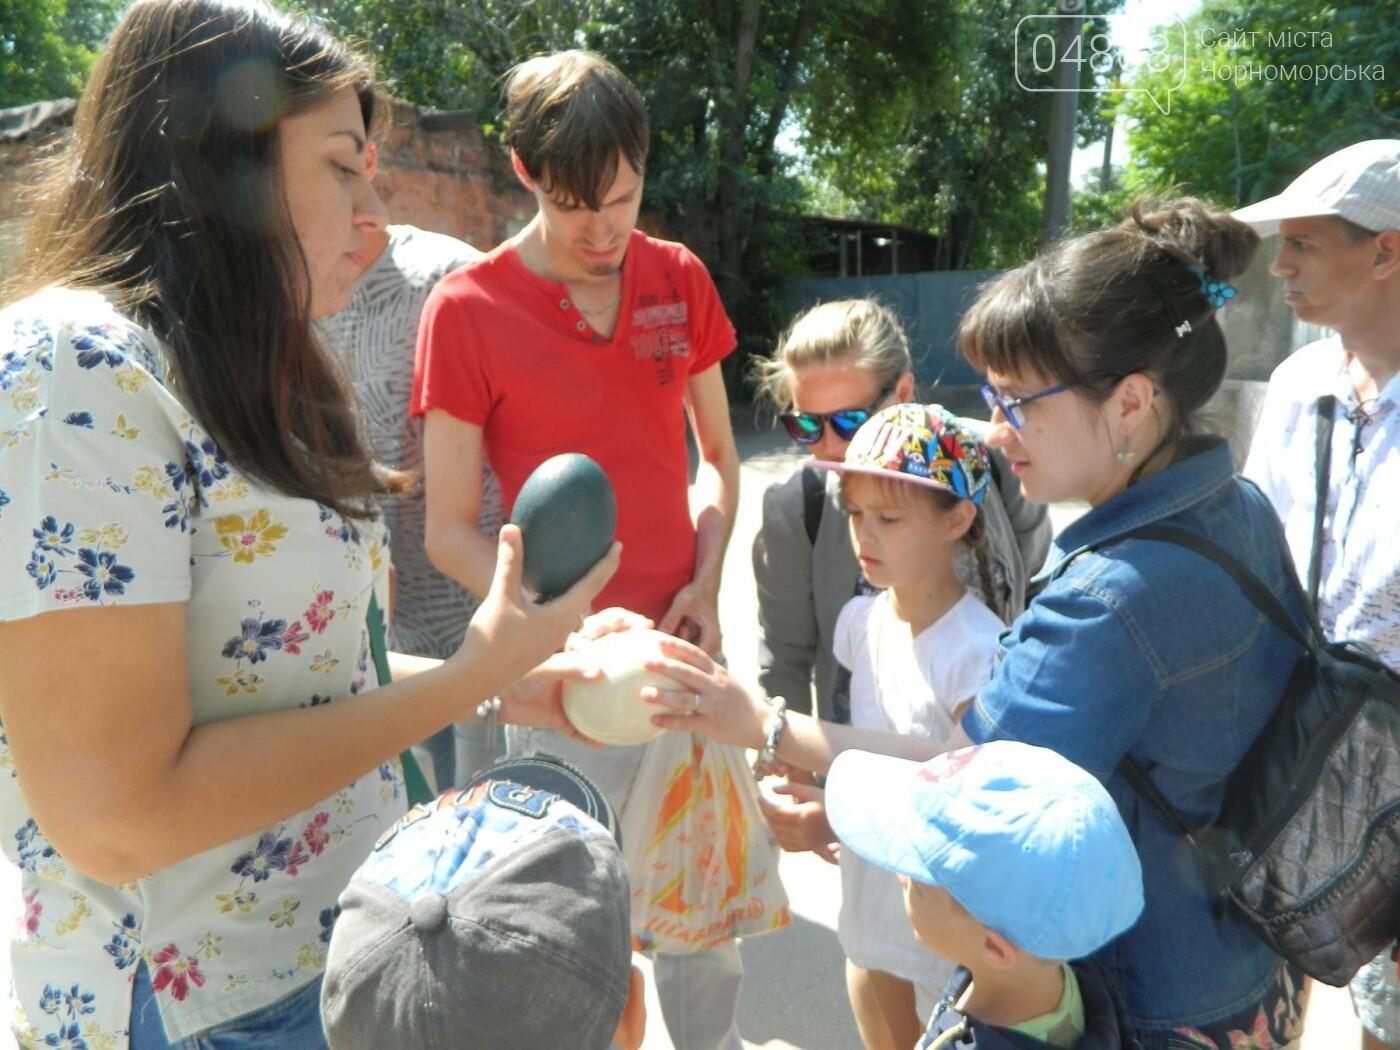 Дети из реабилитационного центра «Радуга» посетили зоопарк, фото-15